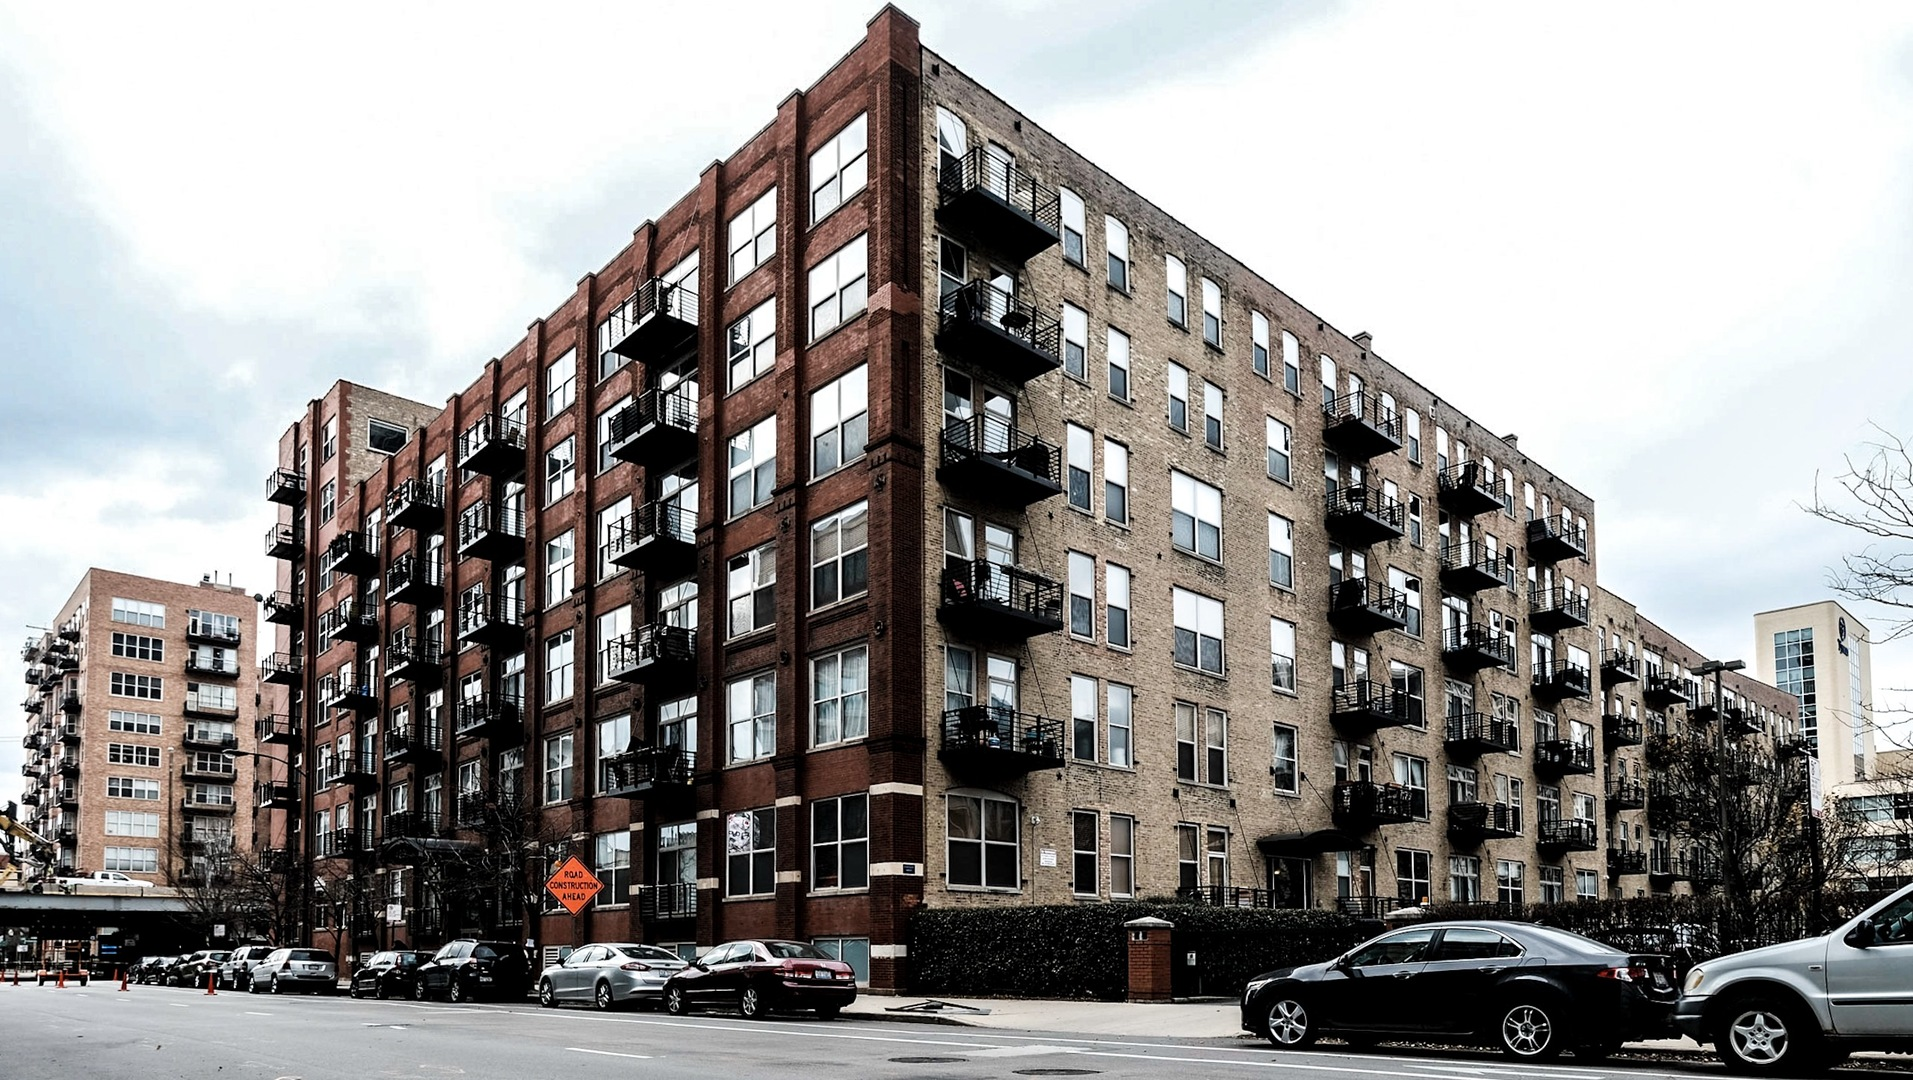 420 SOUTH CLINTON STREET #114A, CHICAGO, IL 60607  Photo